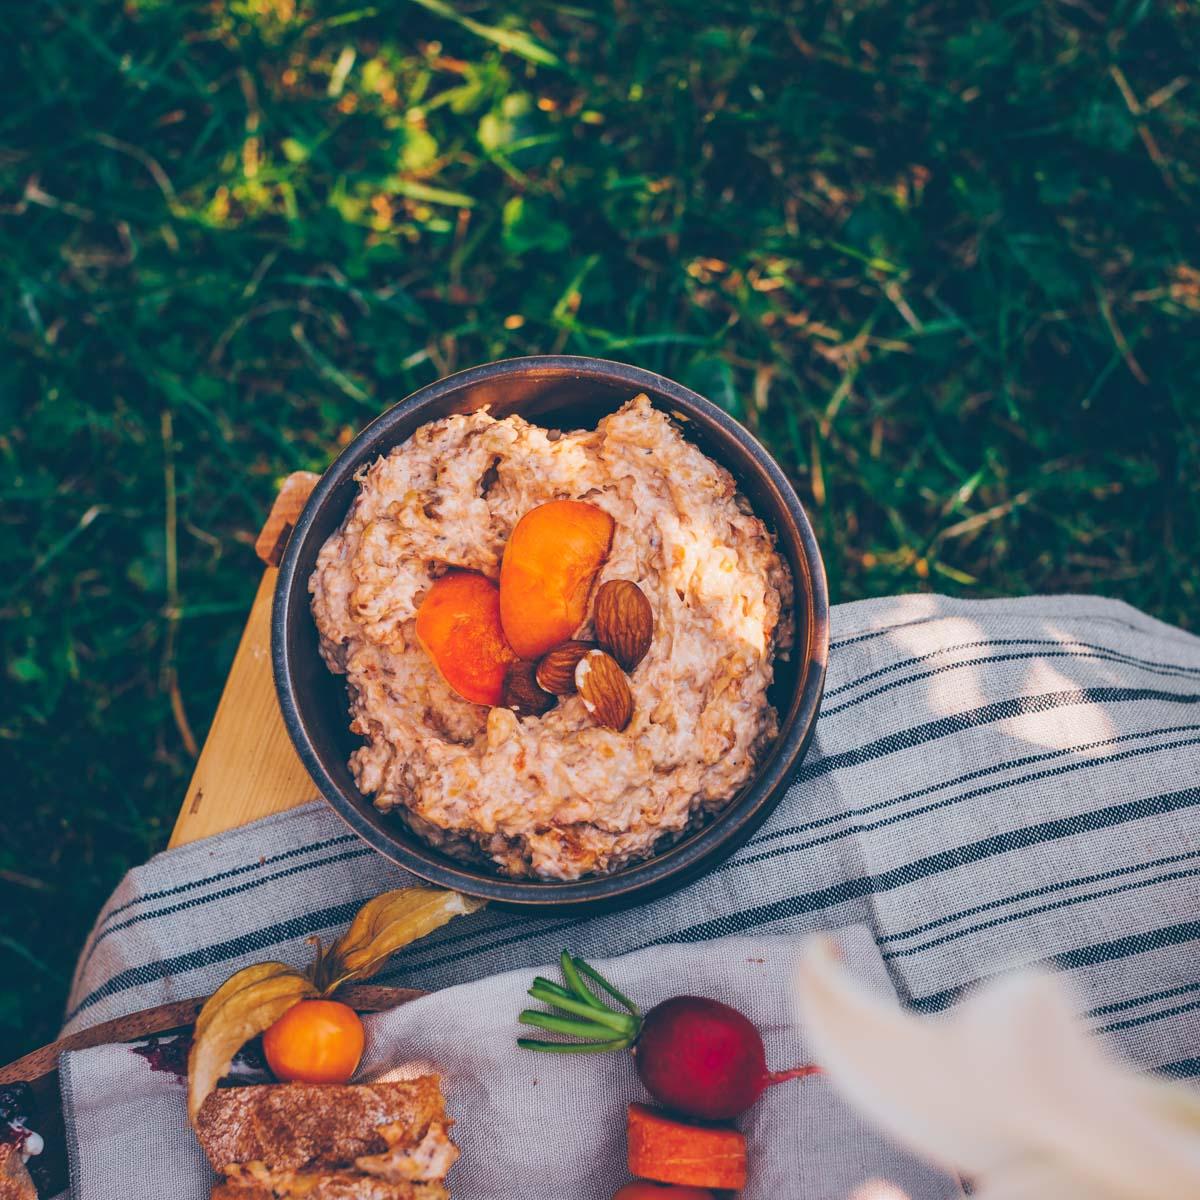 Aprikosen-Mandel Frischkäse vegan